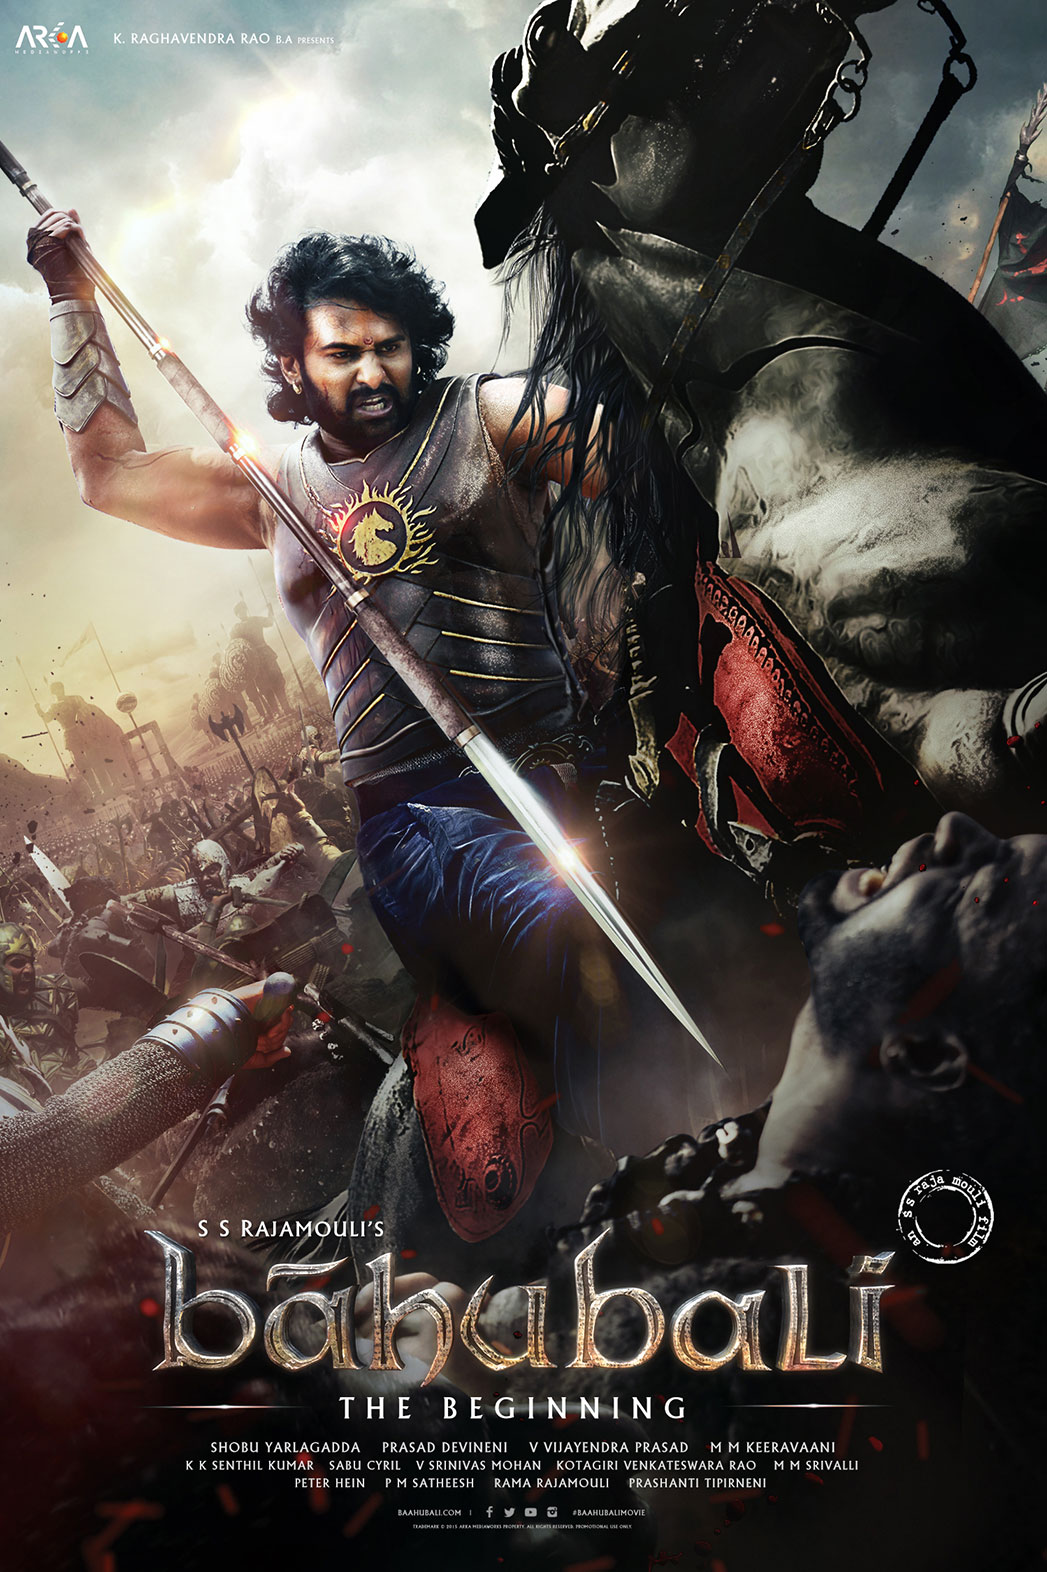 Bahubali The Beginning (2015) เปิดตำนานบาฮูบาลี (ซับไทย)